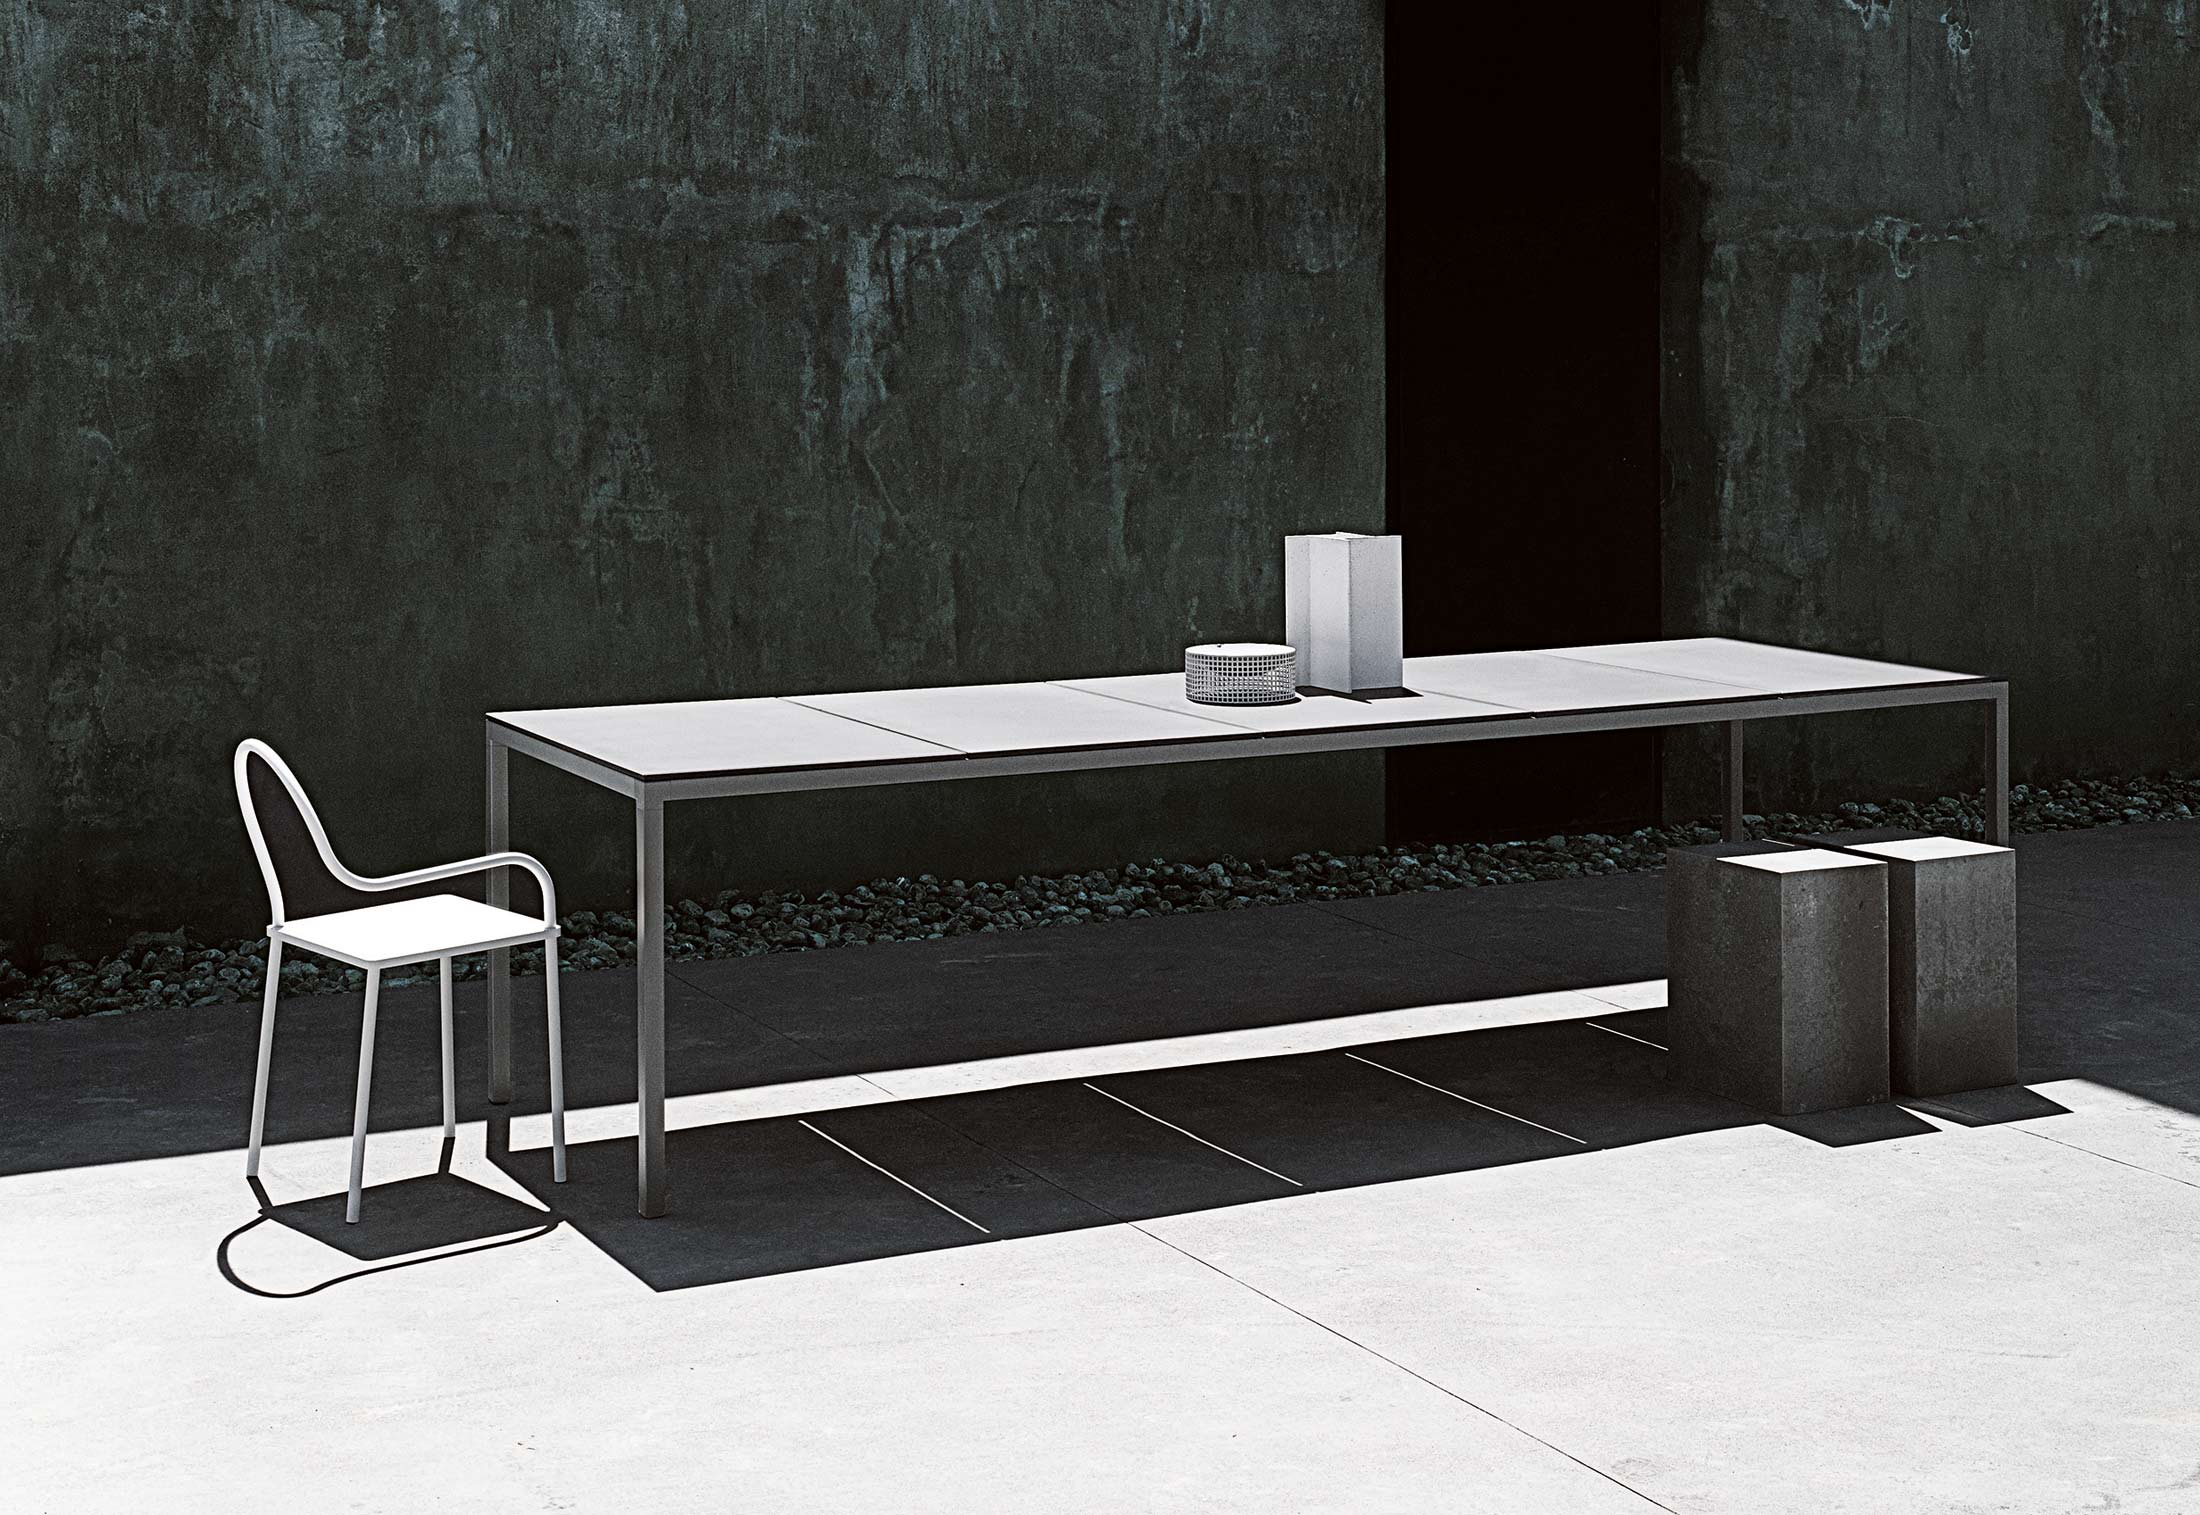 helsinki gartenm bel von desalto walter bissig m bel. Black Bedroom Furniture Sets. Home Design Ideas